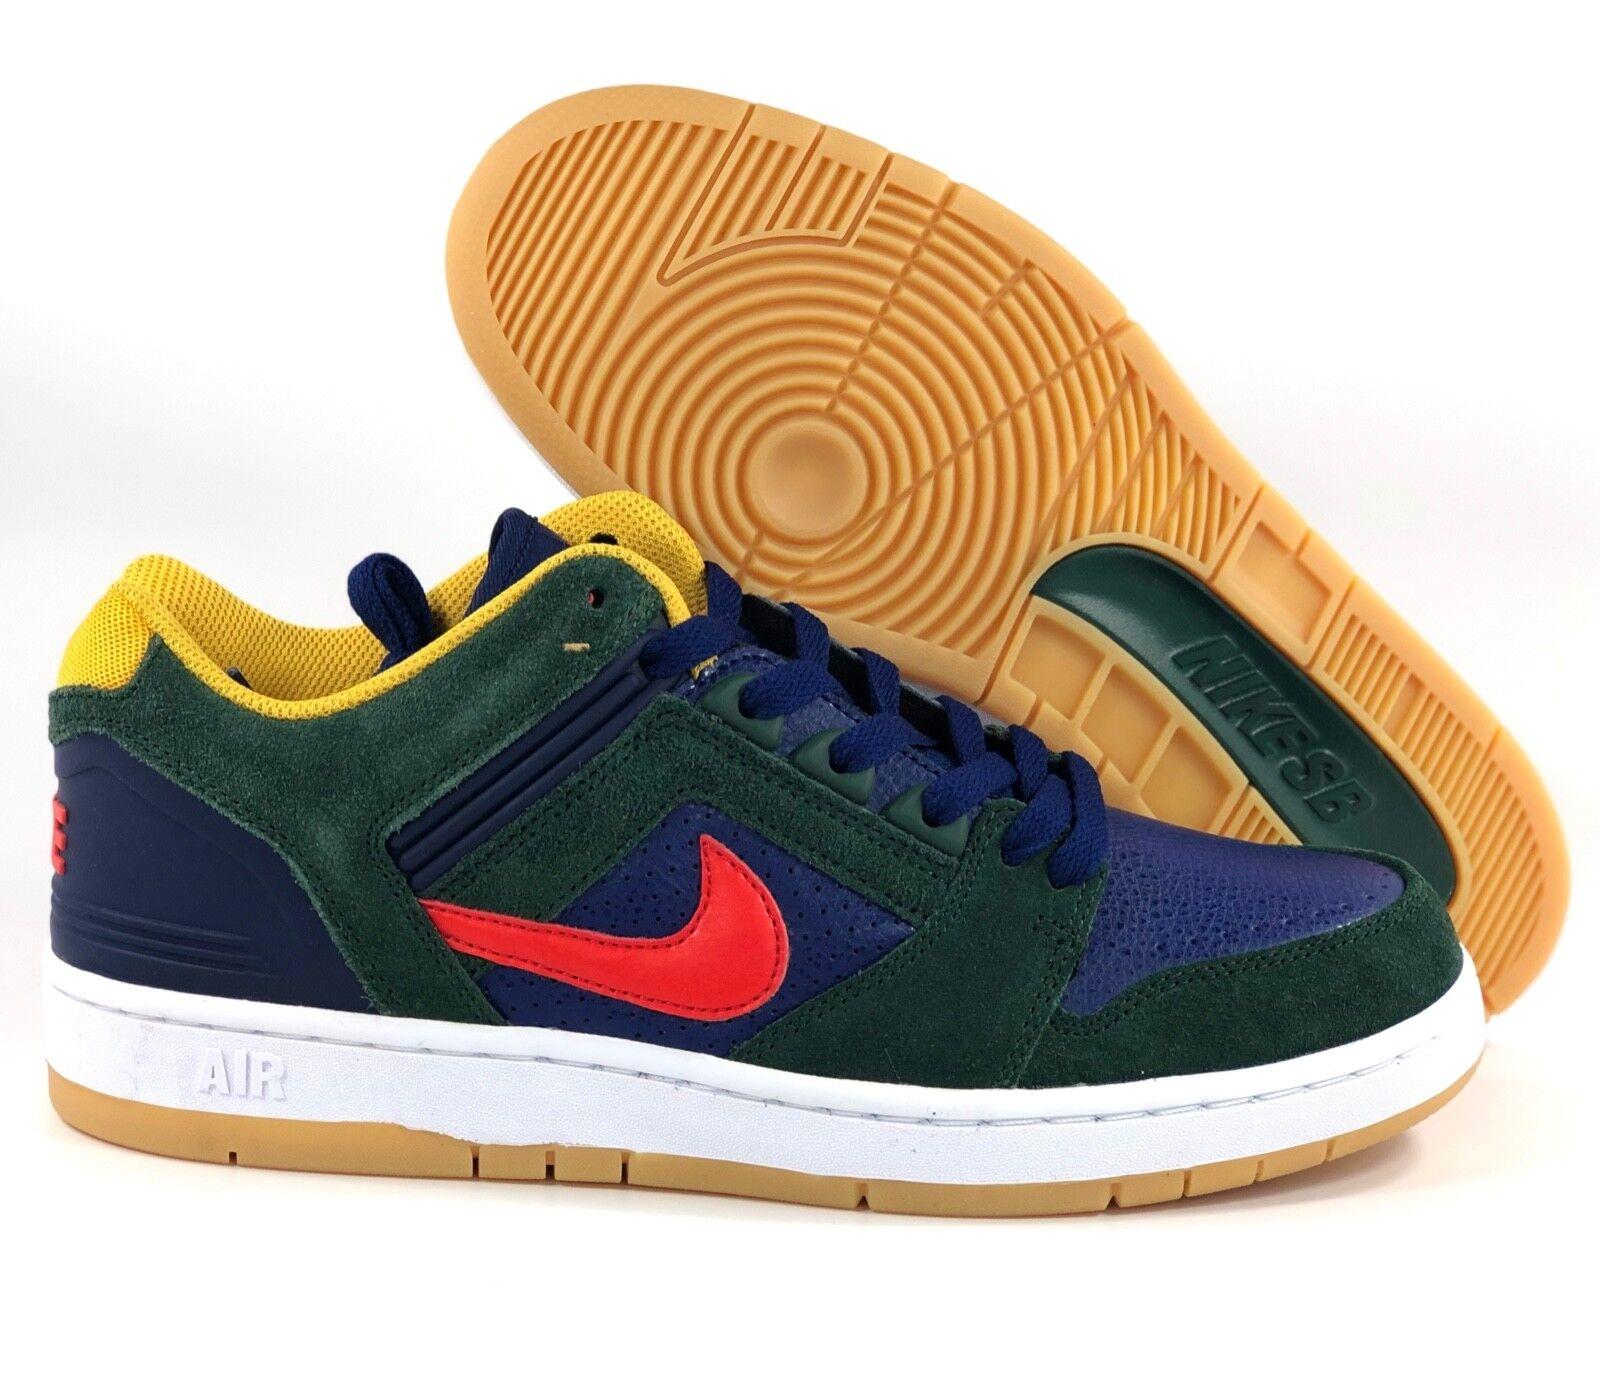 Nike sb air force ii niedrigen niedrigen niedrigen dunklen grün - rot blau - gelb ao0300-364 männer 8 - 10 f4e130